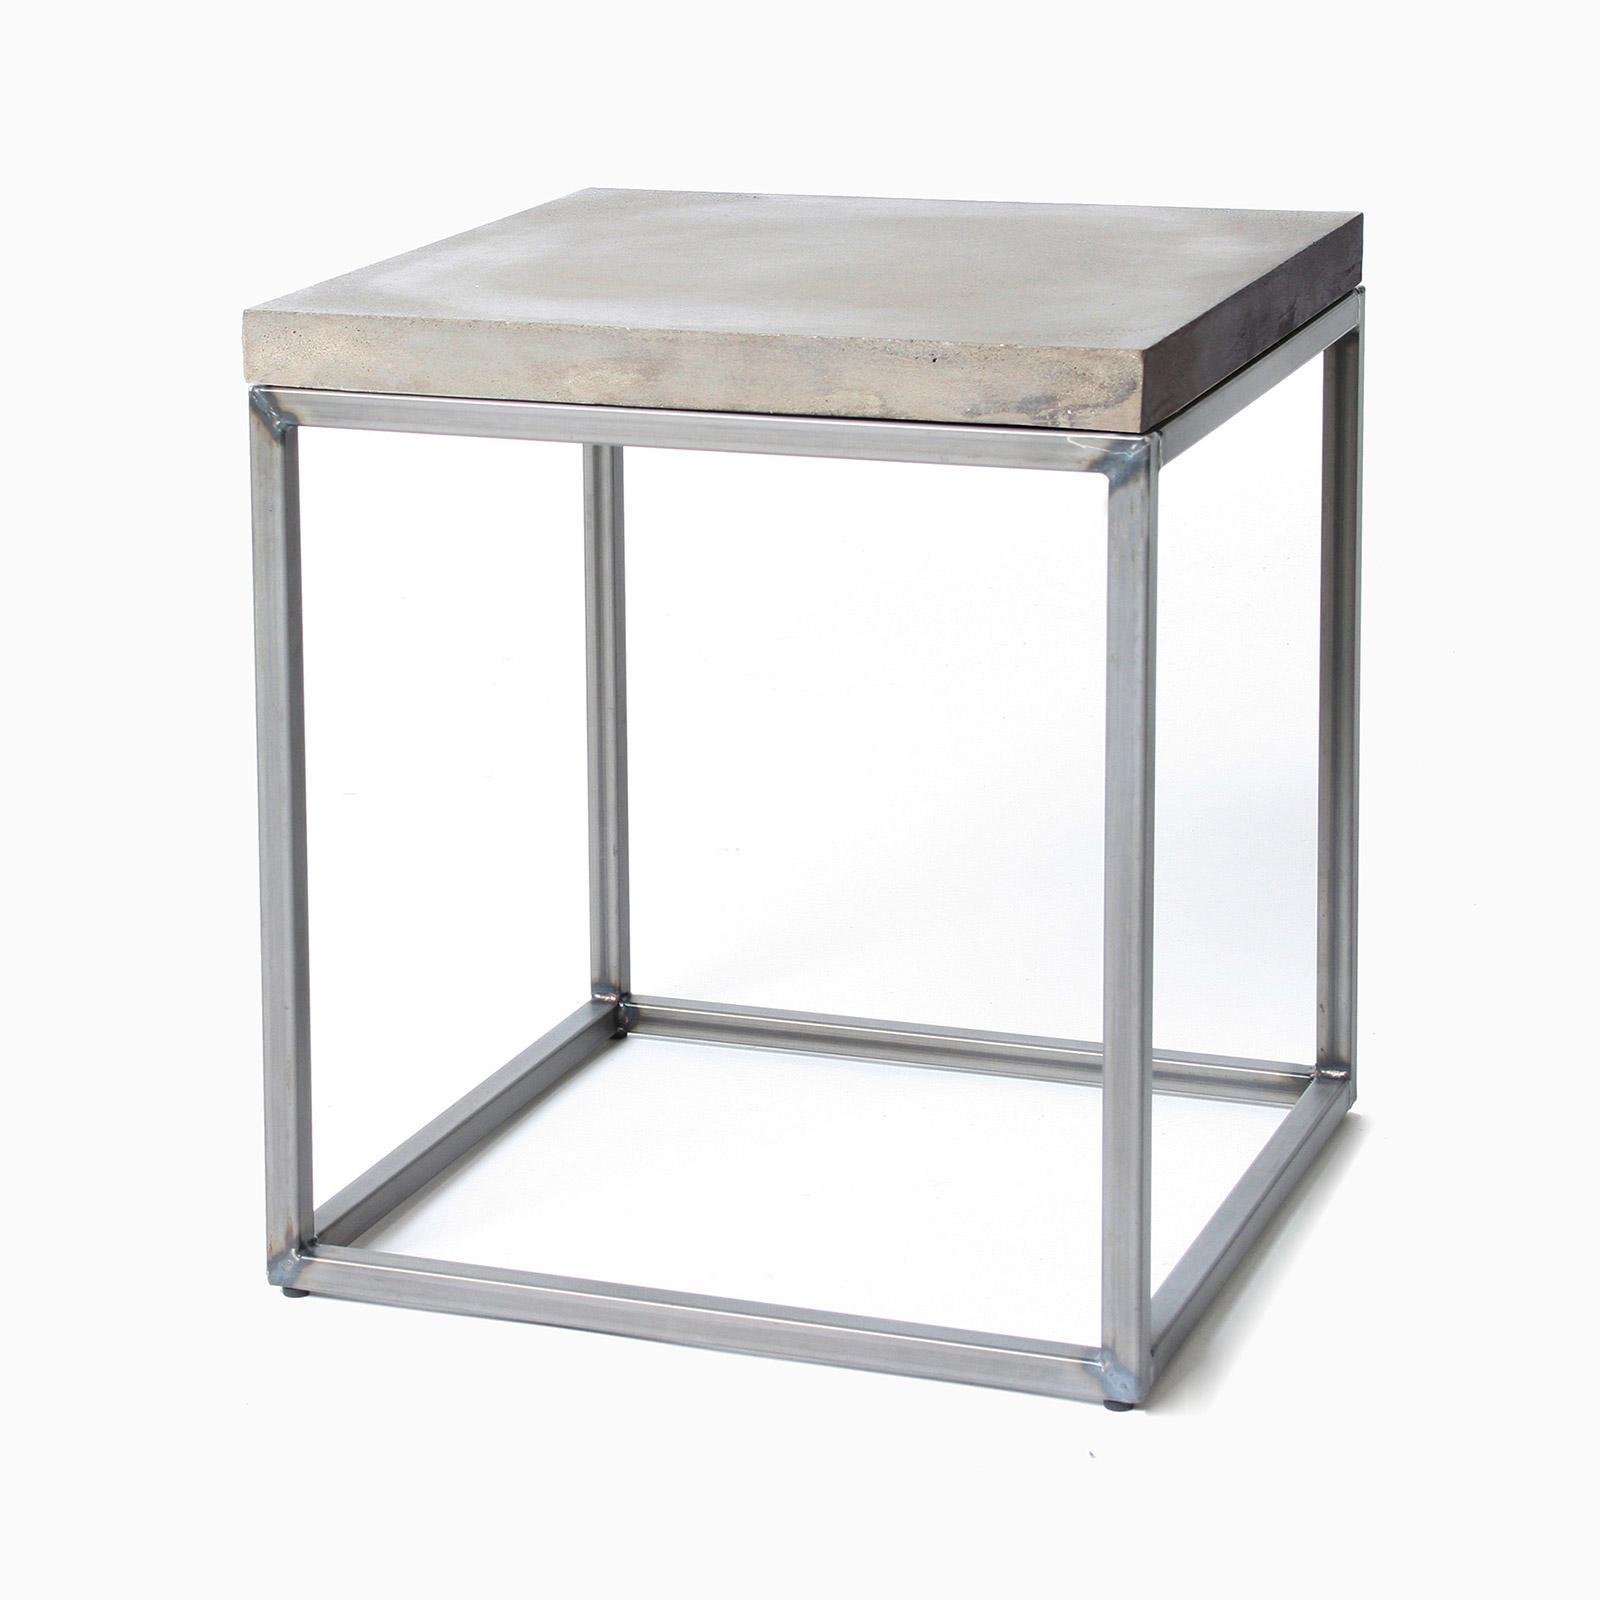 lyon beton concrete perspective side table beyond home. Black Bedroom Furniture Sets. Home Design Ideas